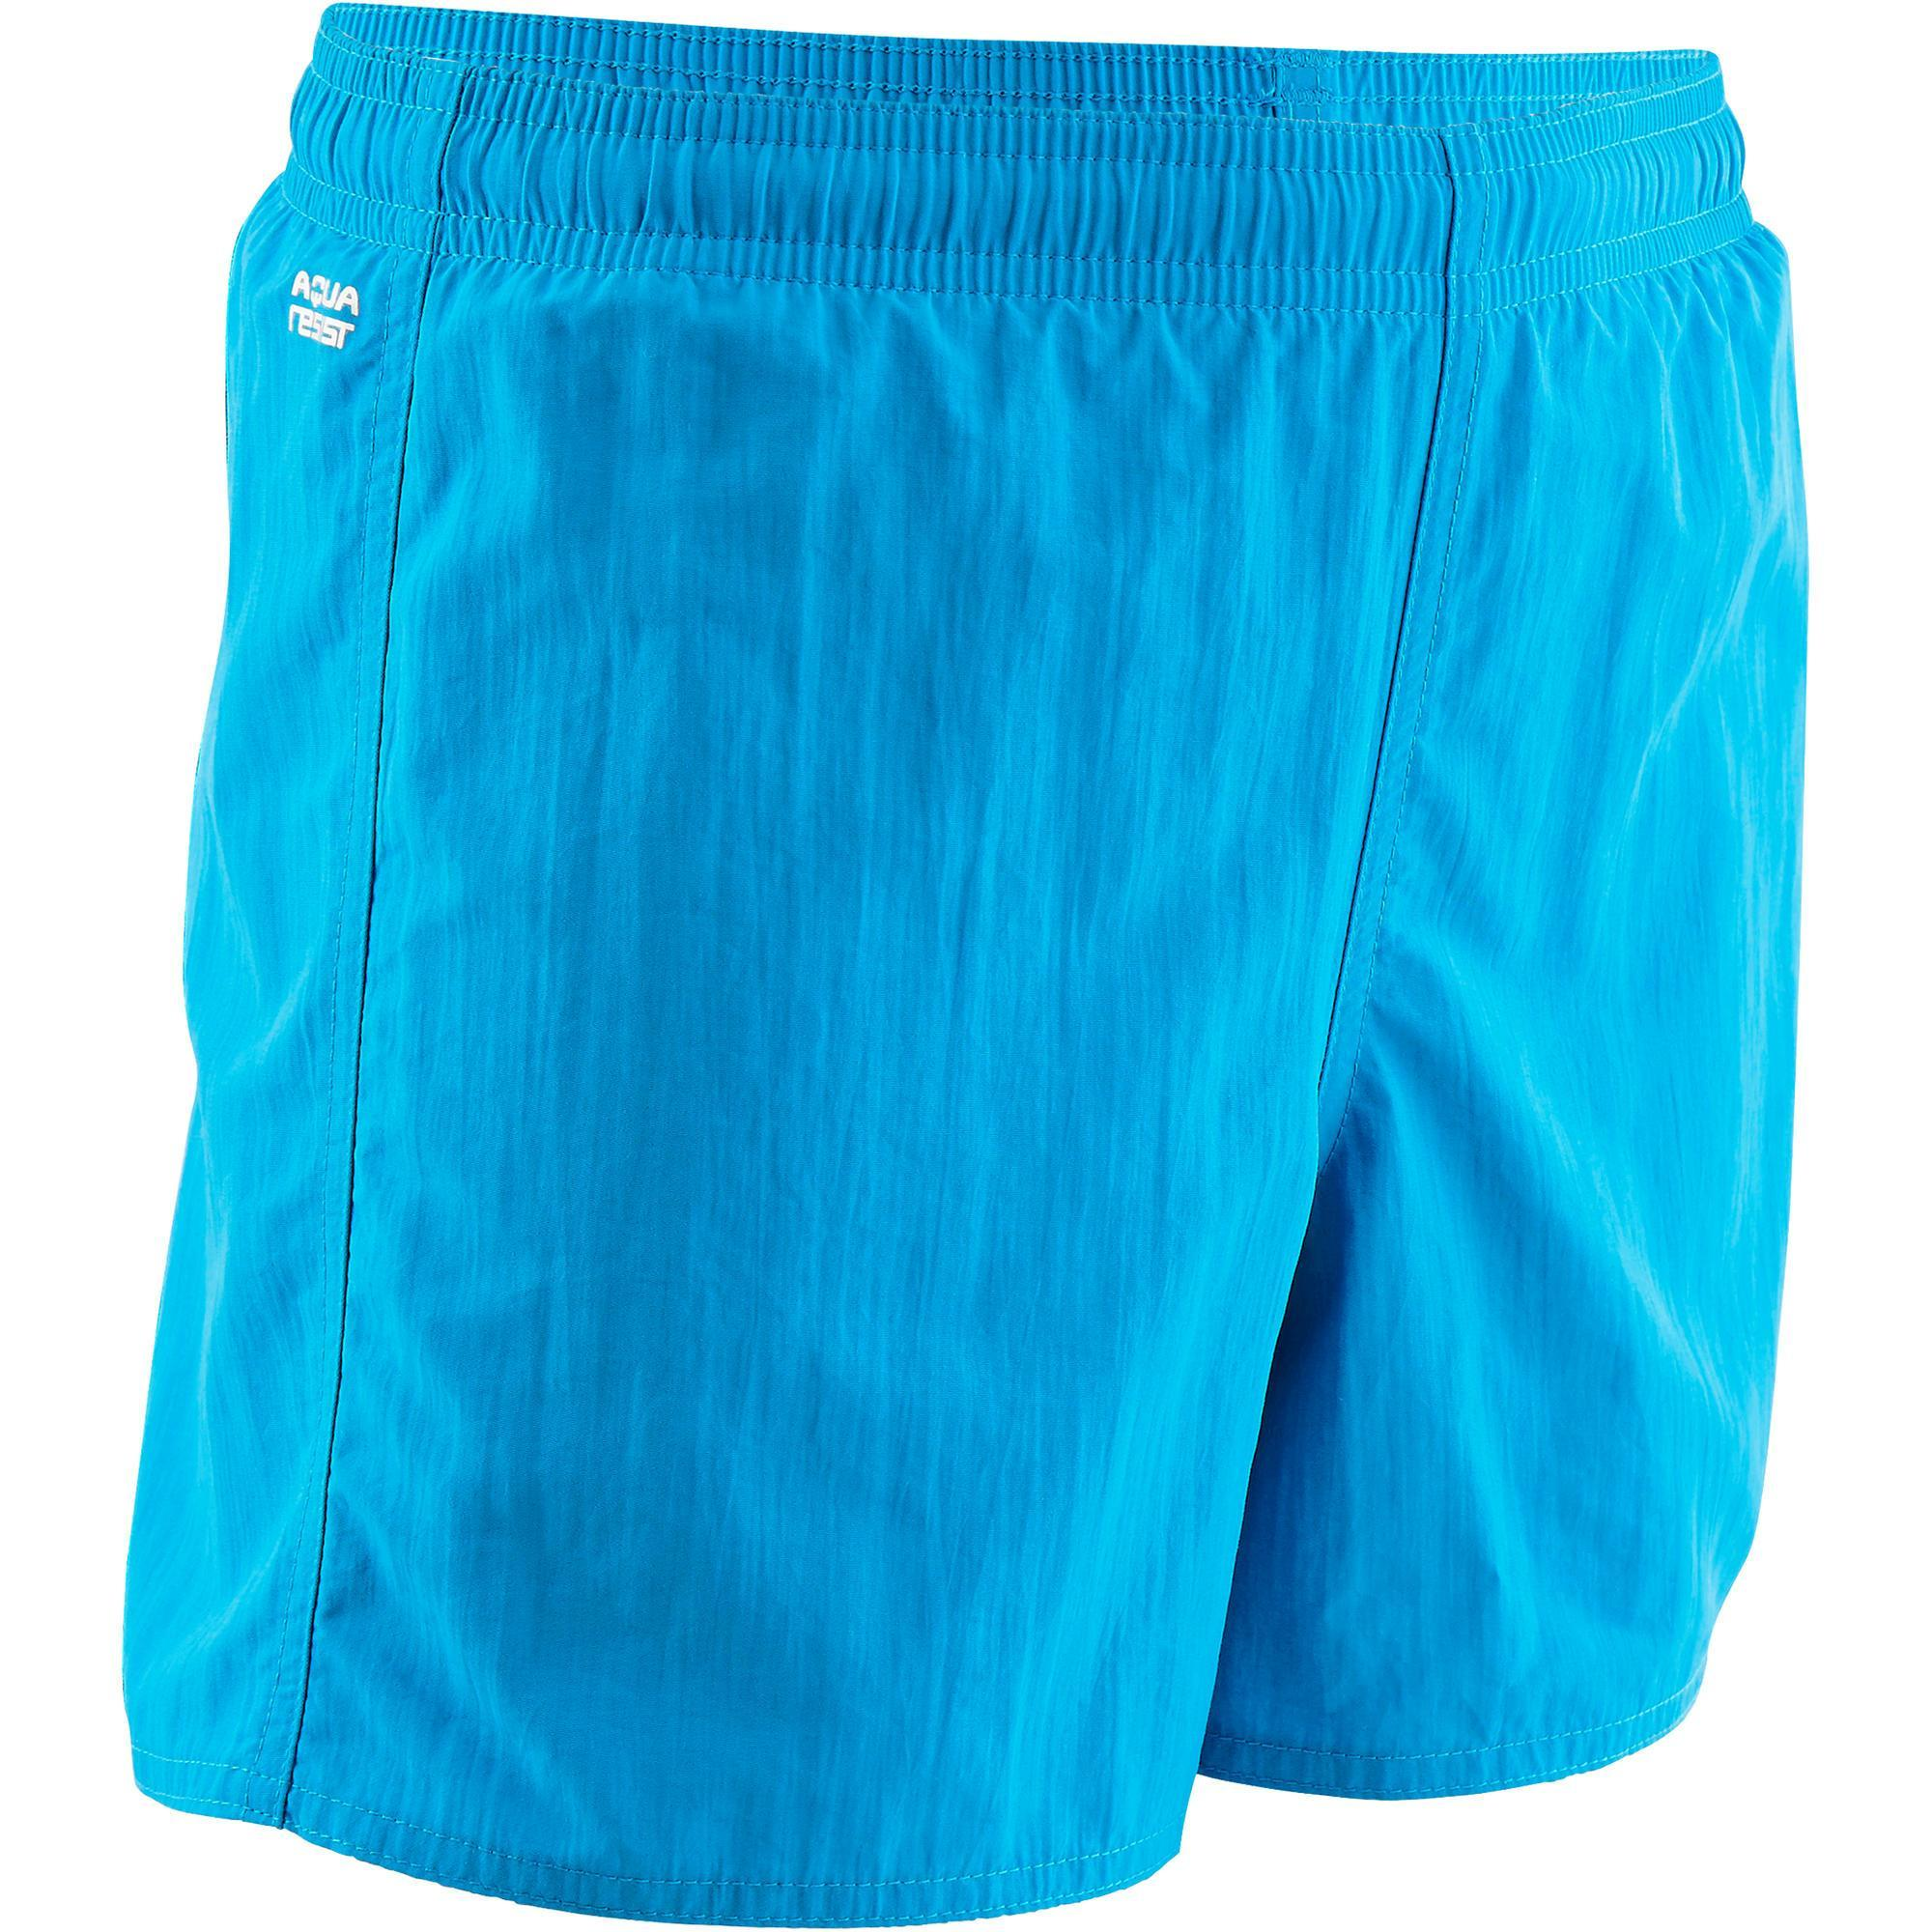 Nabaiji Zwemshort voor jongens Swim Short 100 blauw